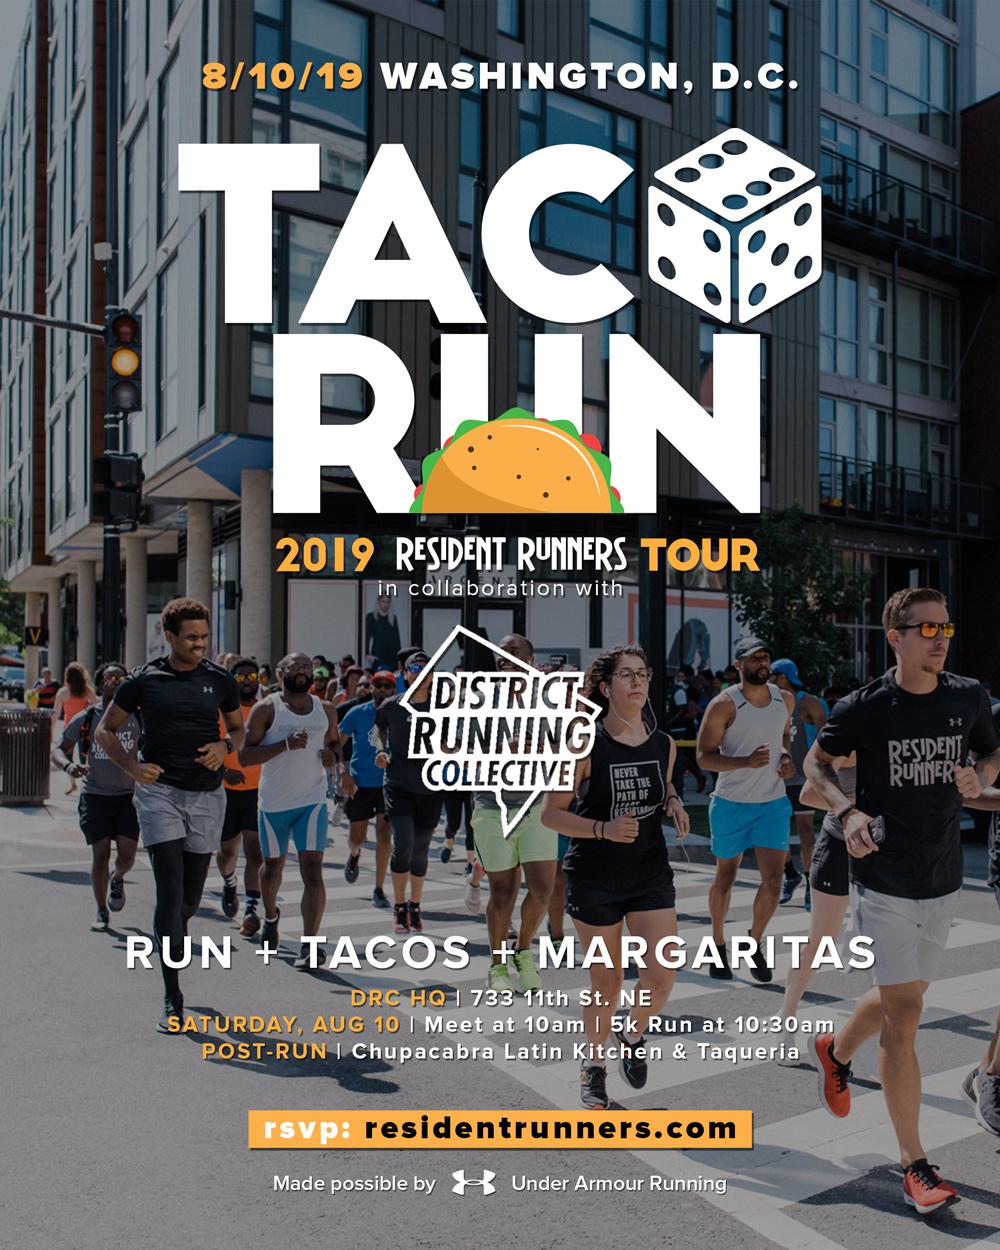 dc_taco_run_tour_flyer_v1-web.jpg